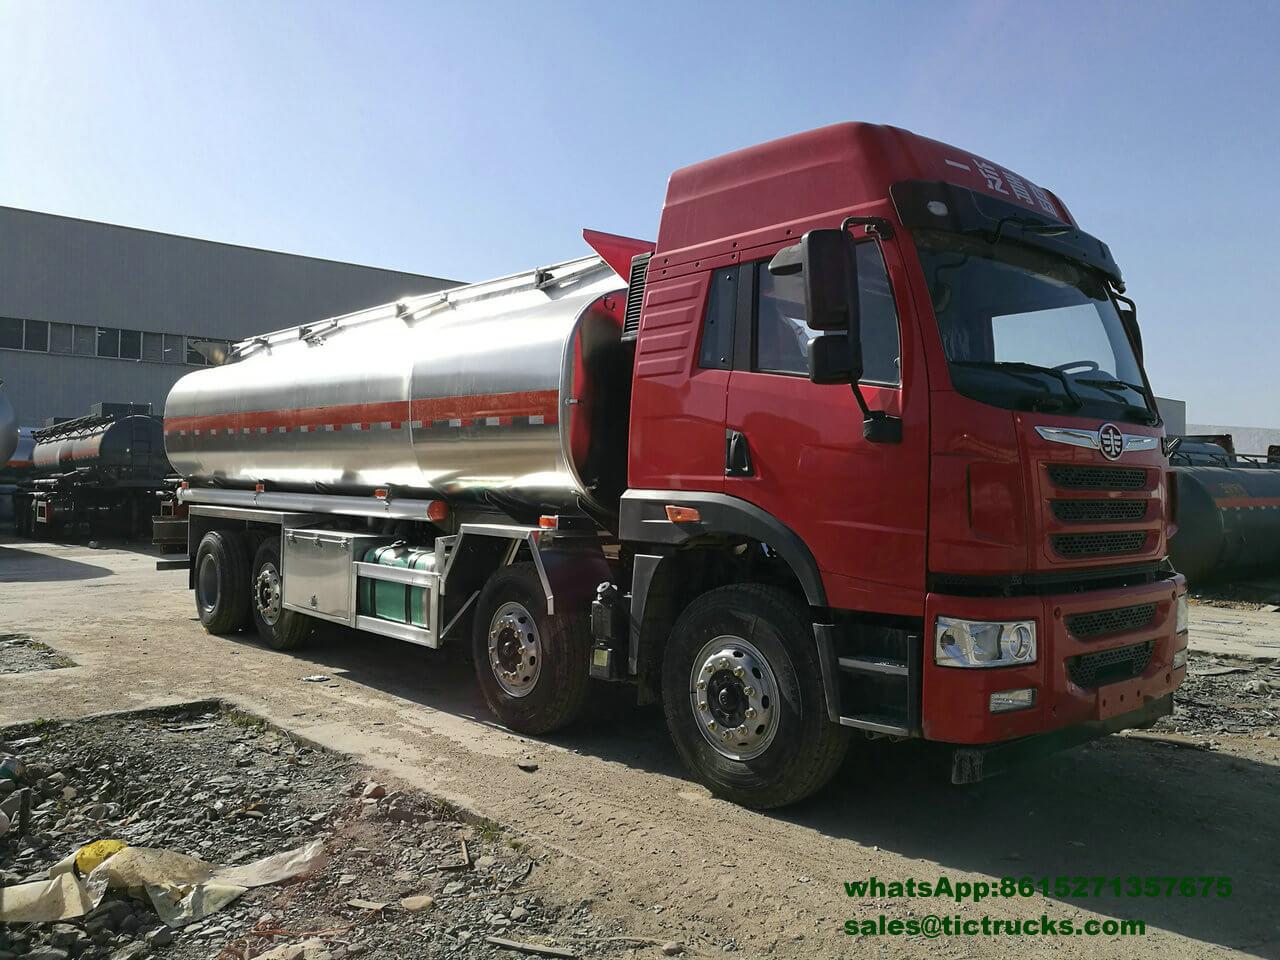 Camion-citerne -008-FAW-truck_1.jpg d'alliage d'aluminium